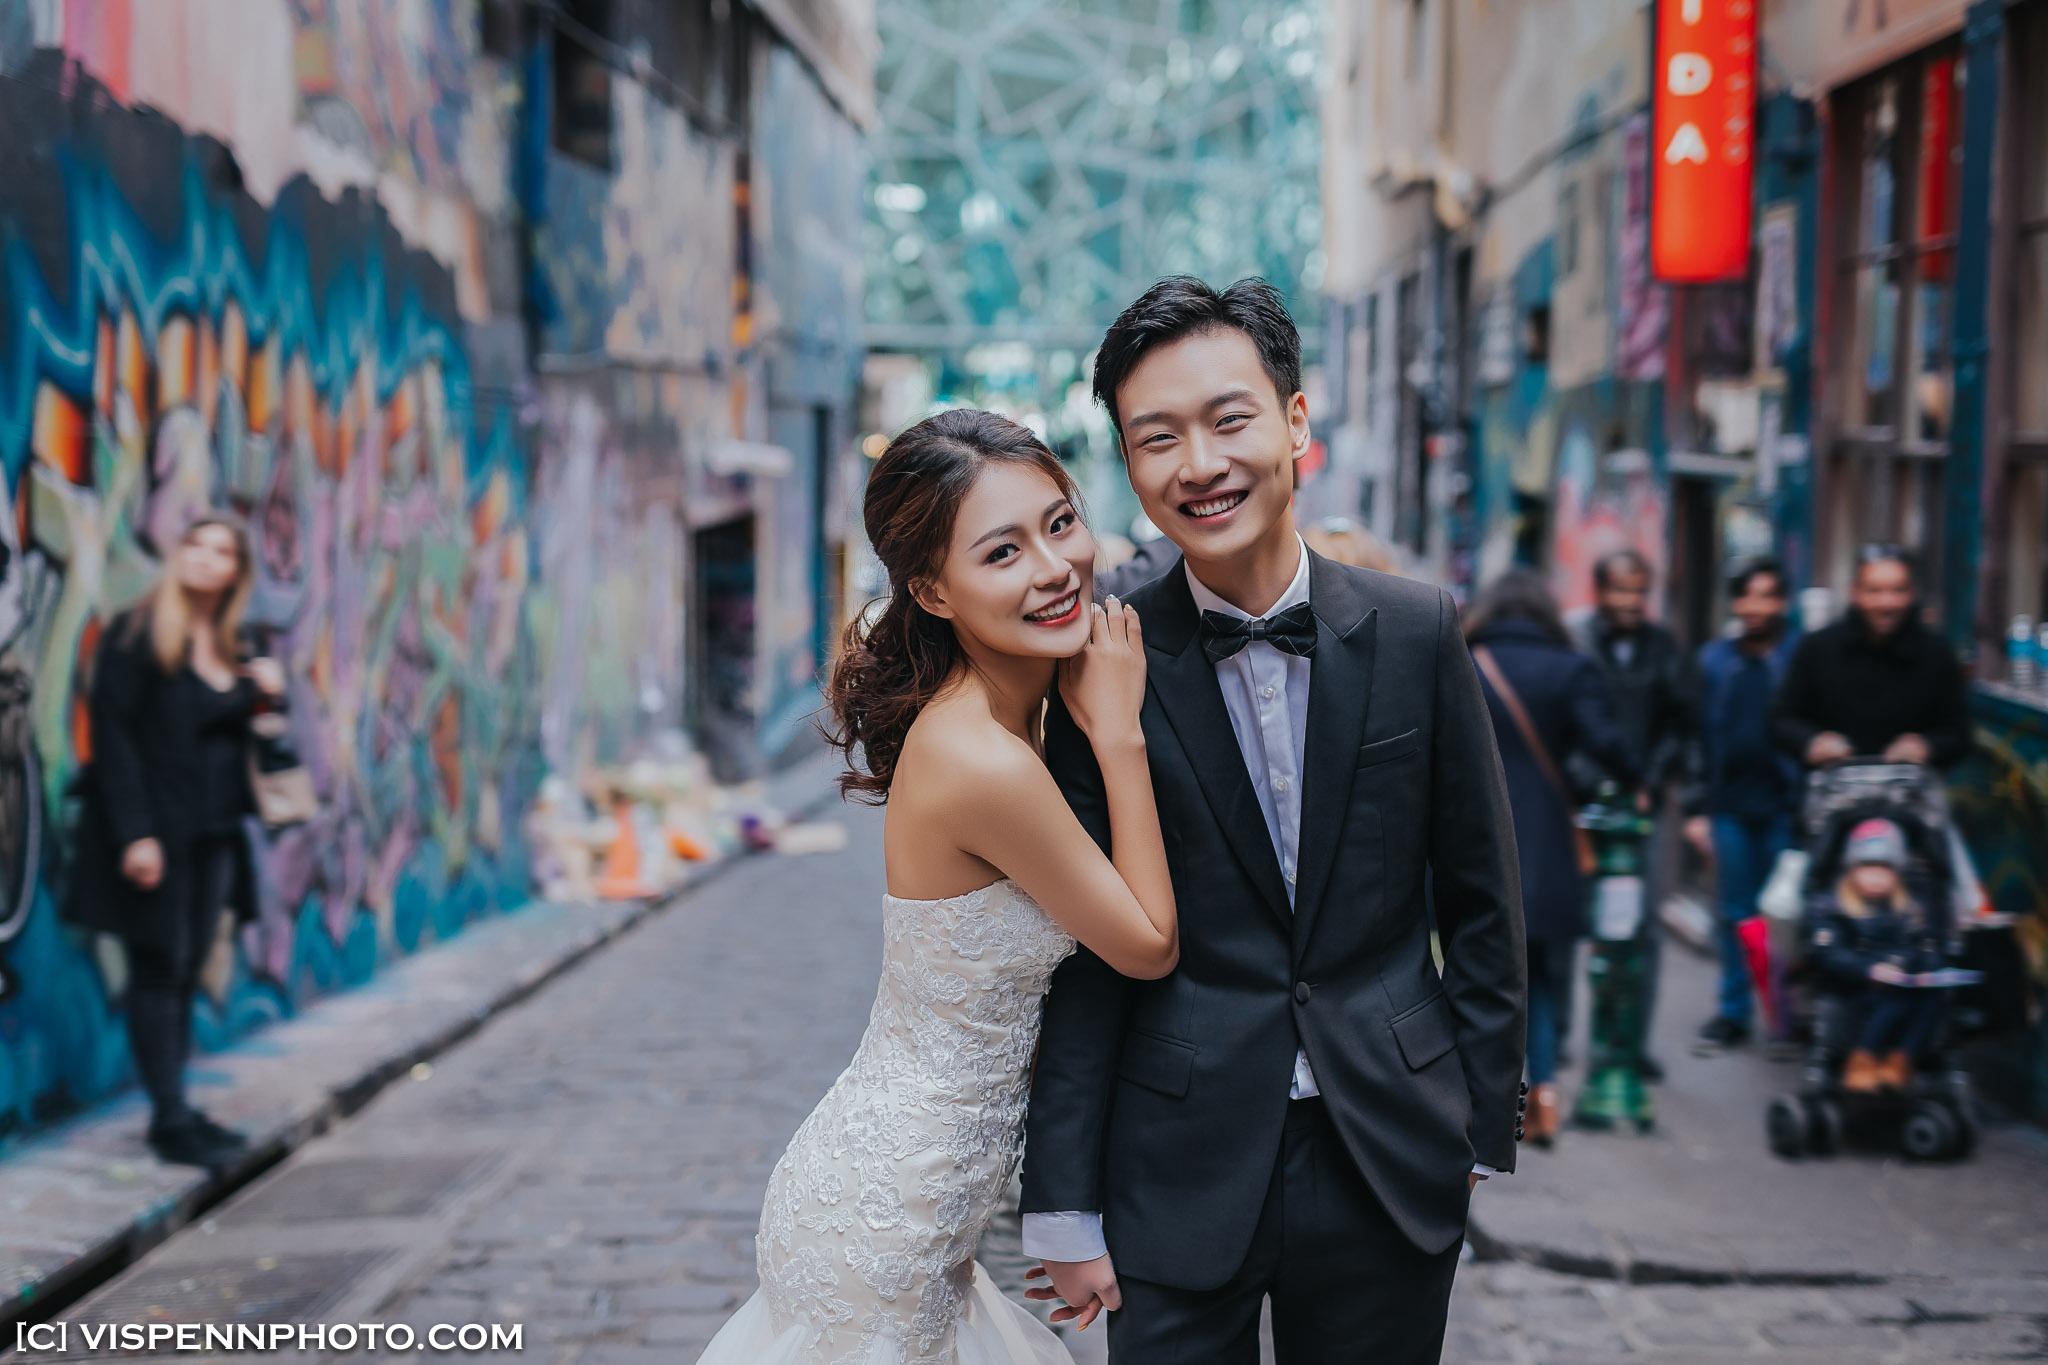 PRE WEDDING Photography Melbourne 5D5 4209